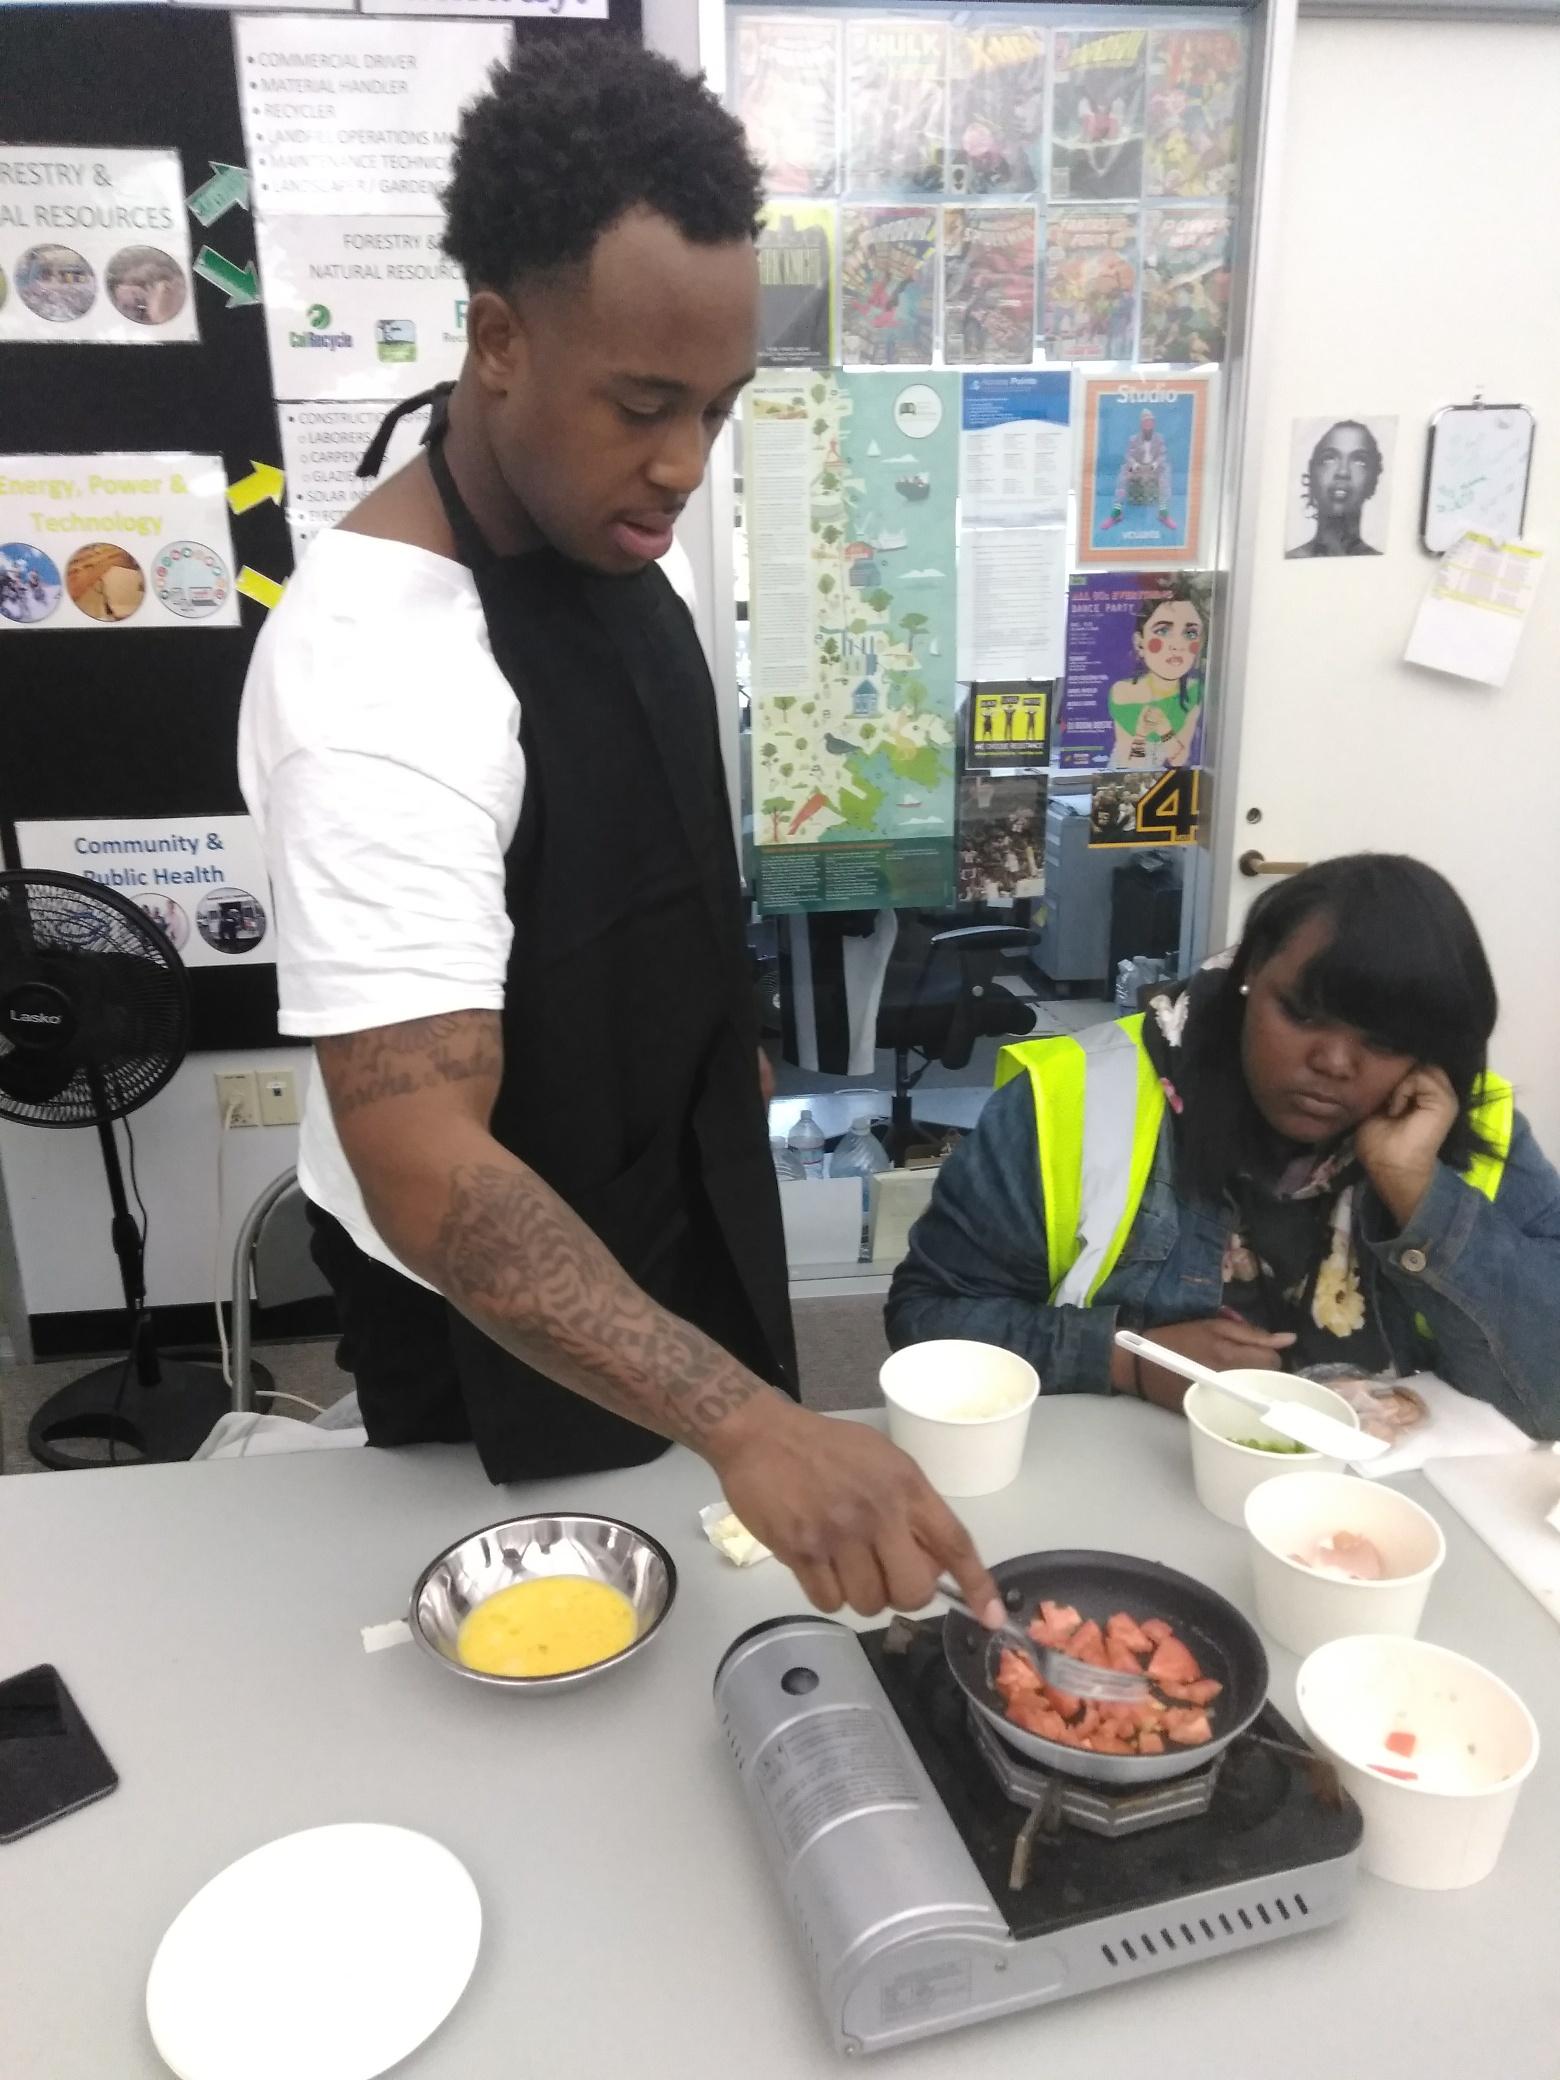 Zaire Cooking - Week#2 Day 1 Food  Cooking.jpg